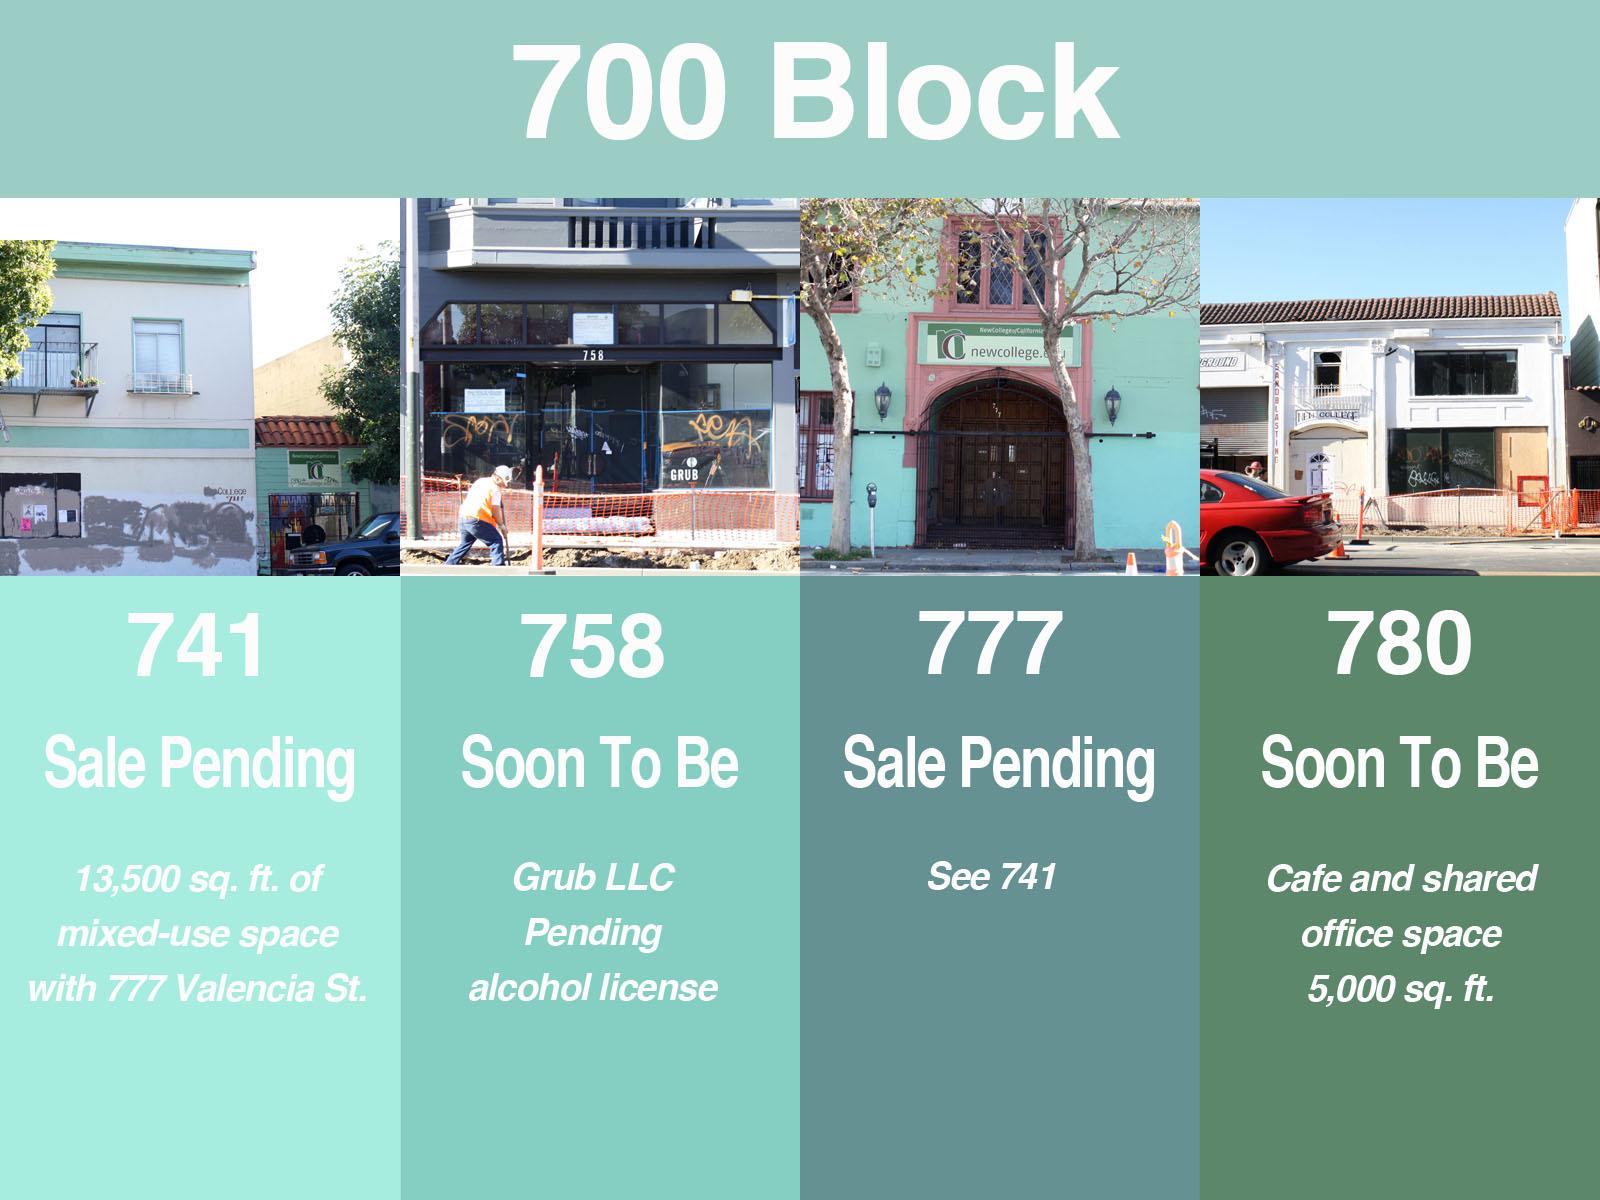 700 Block